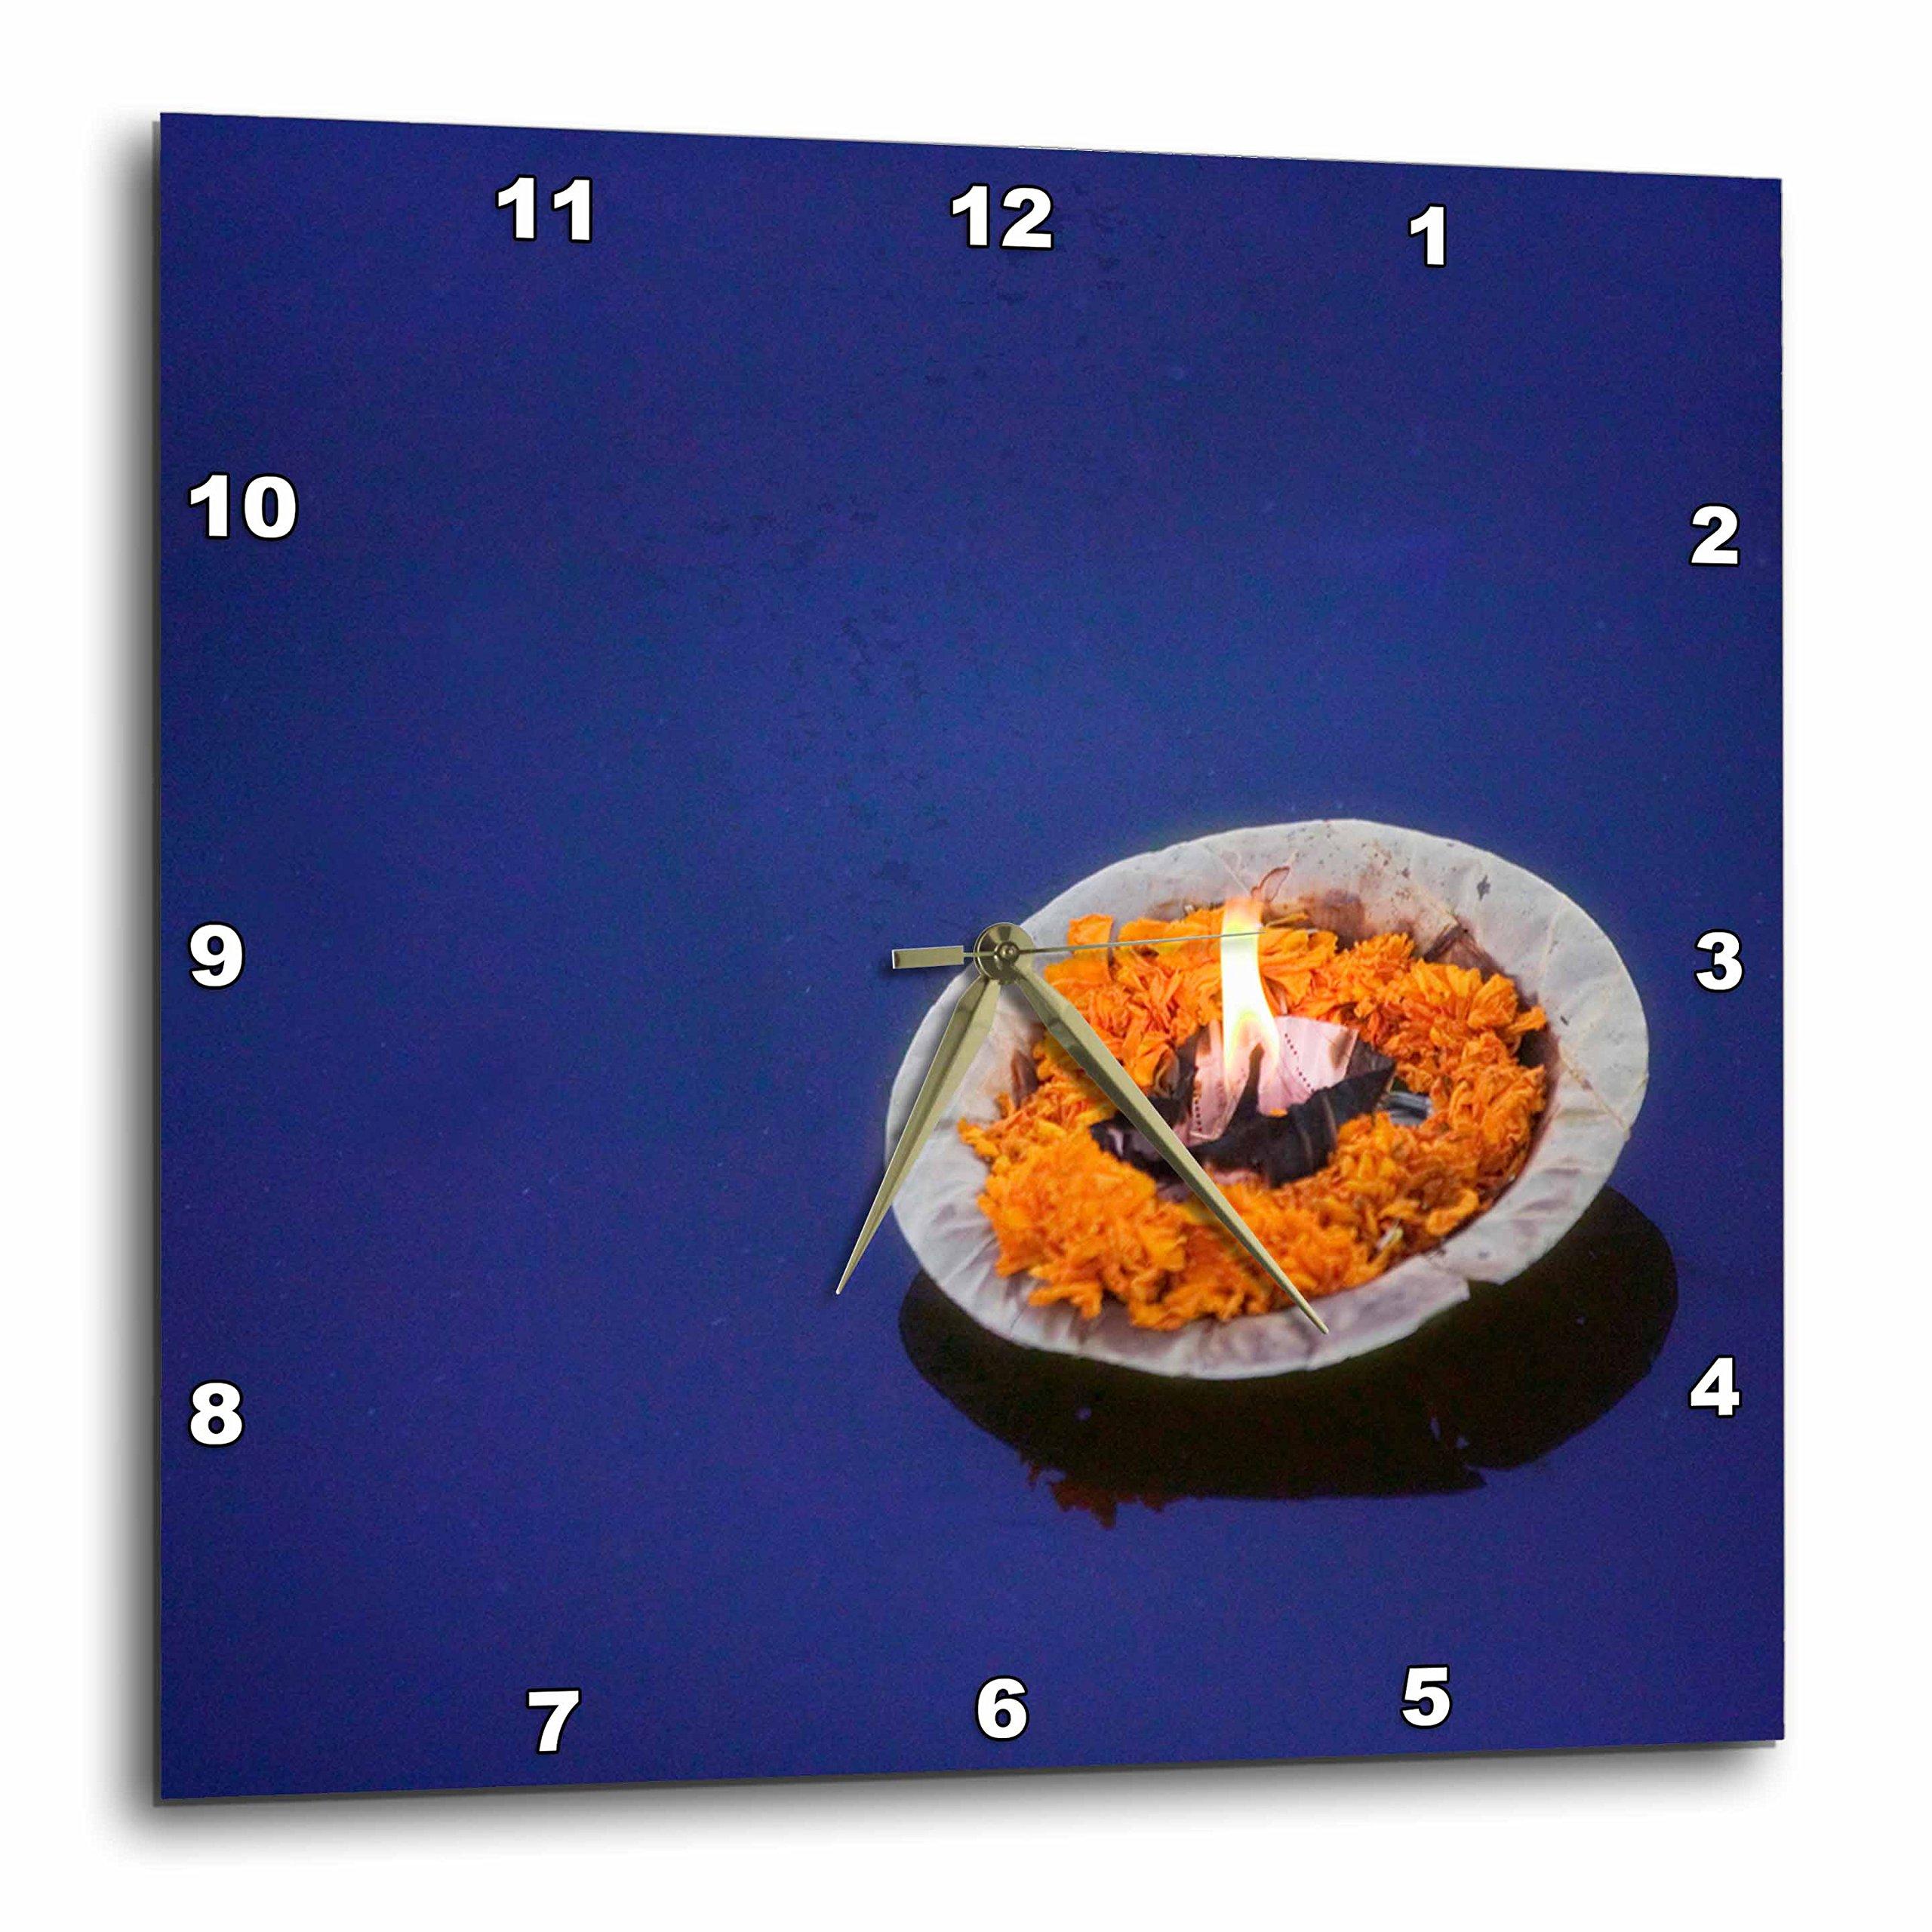 3dRose dpp_72670_2 Flower Candle in The Ganges River, Varanasi, India-AS10 KSU0128-Keren Su-Wall Clock, 13 by 13-Inch